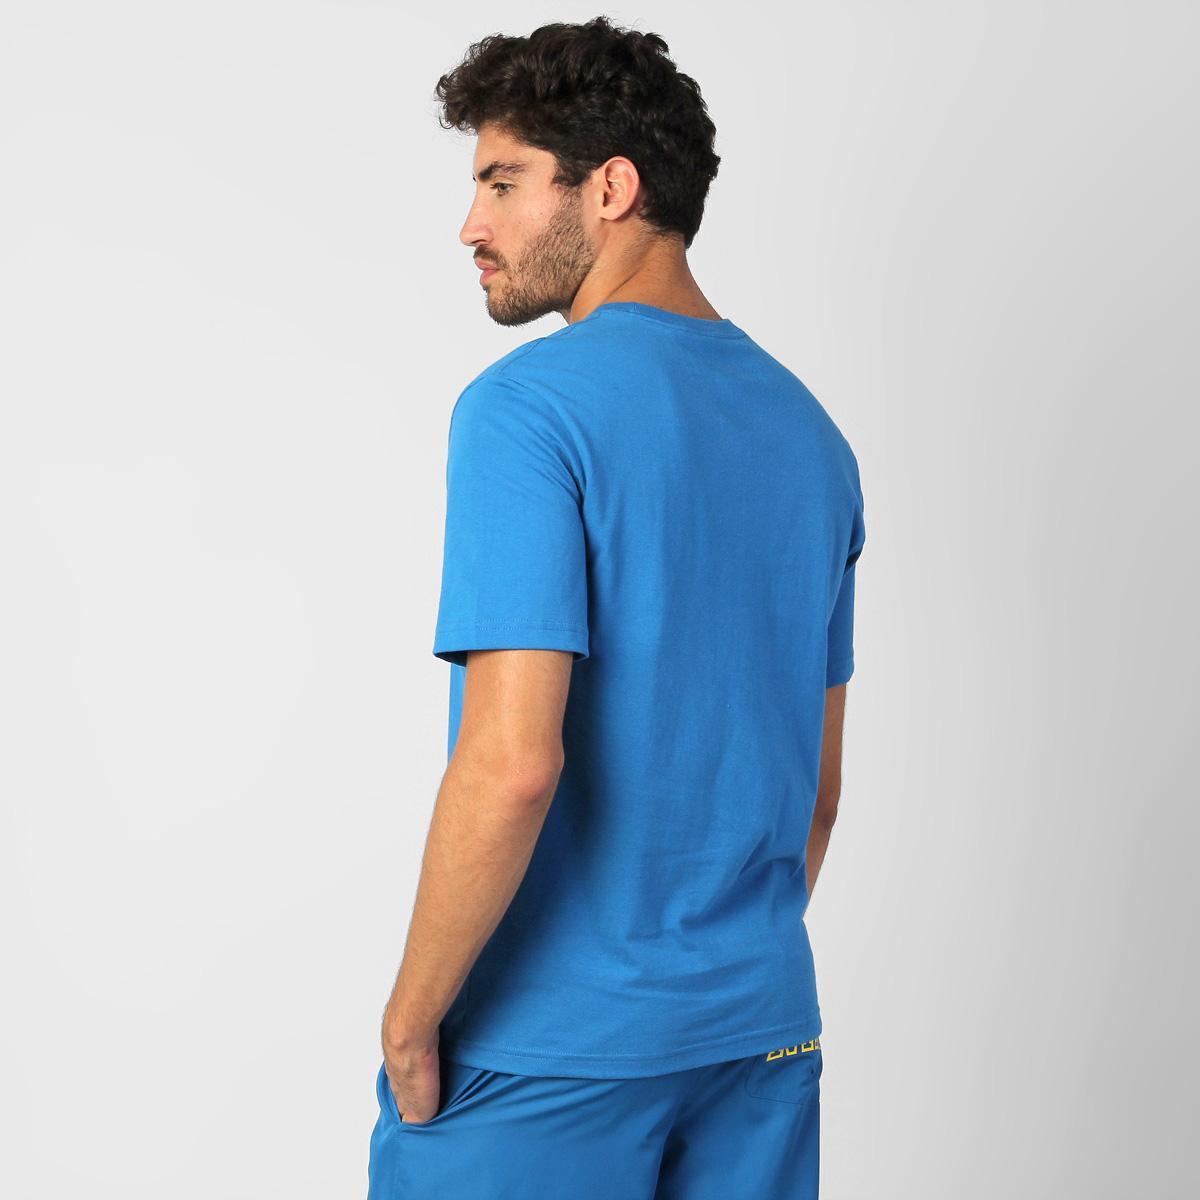 Camiseta Nike Emea Chest Swoosh - Compre Agora  0c16980f4a6c3